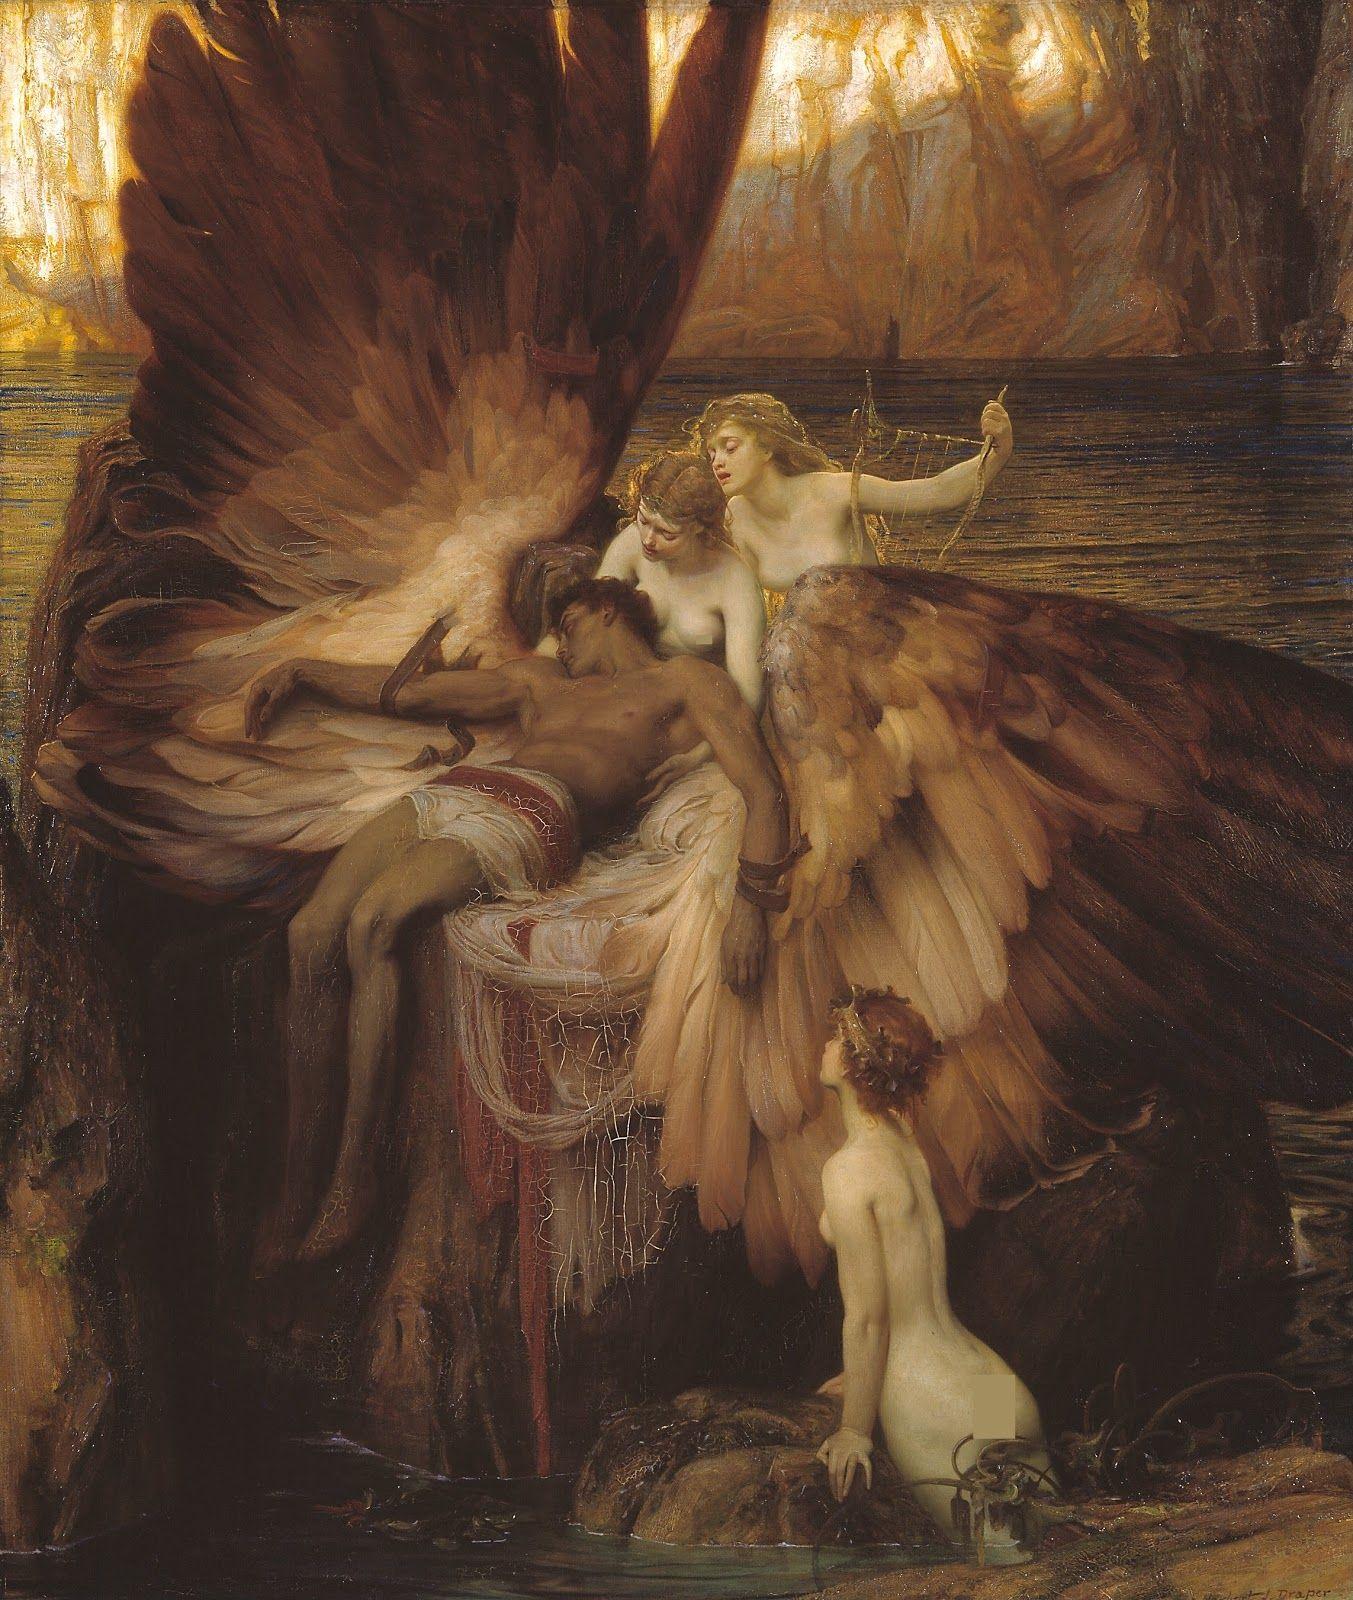 Herbert Draper (1863-1920) Classicist painter